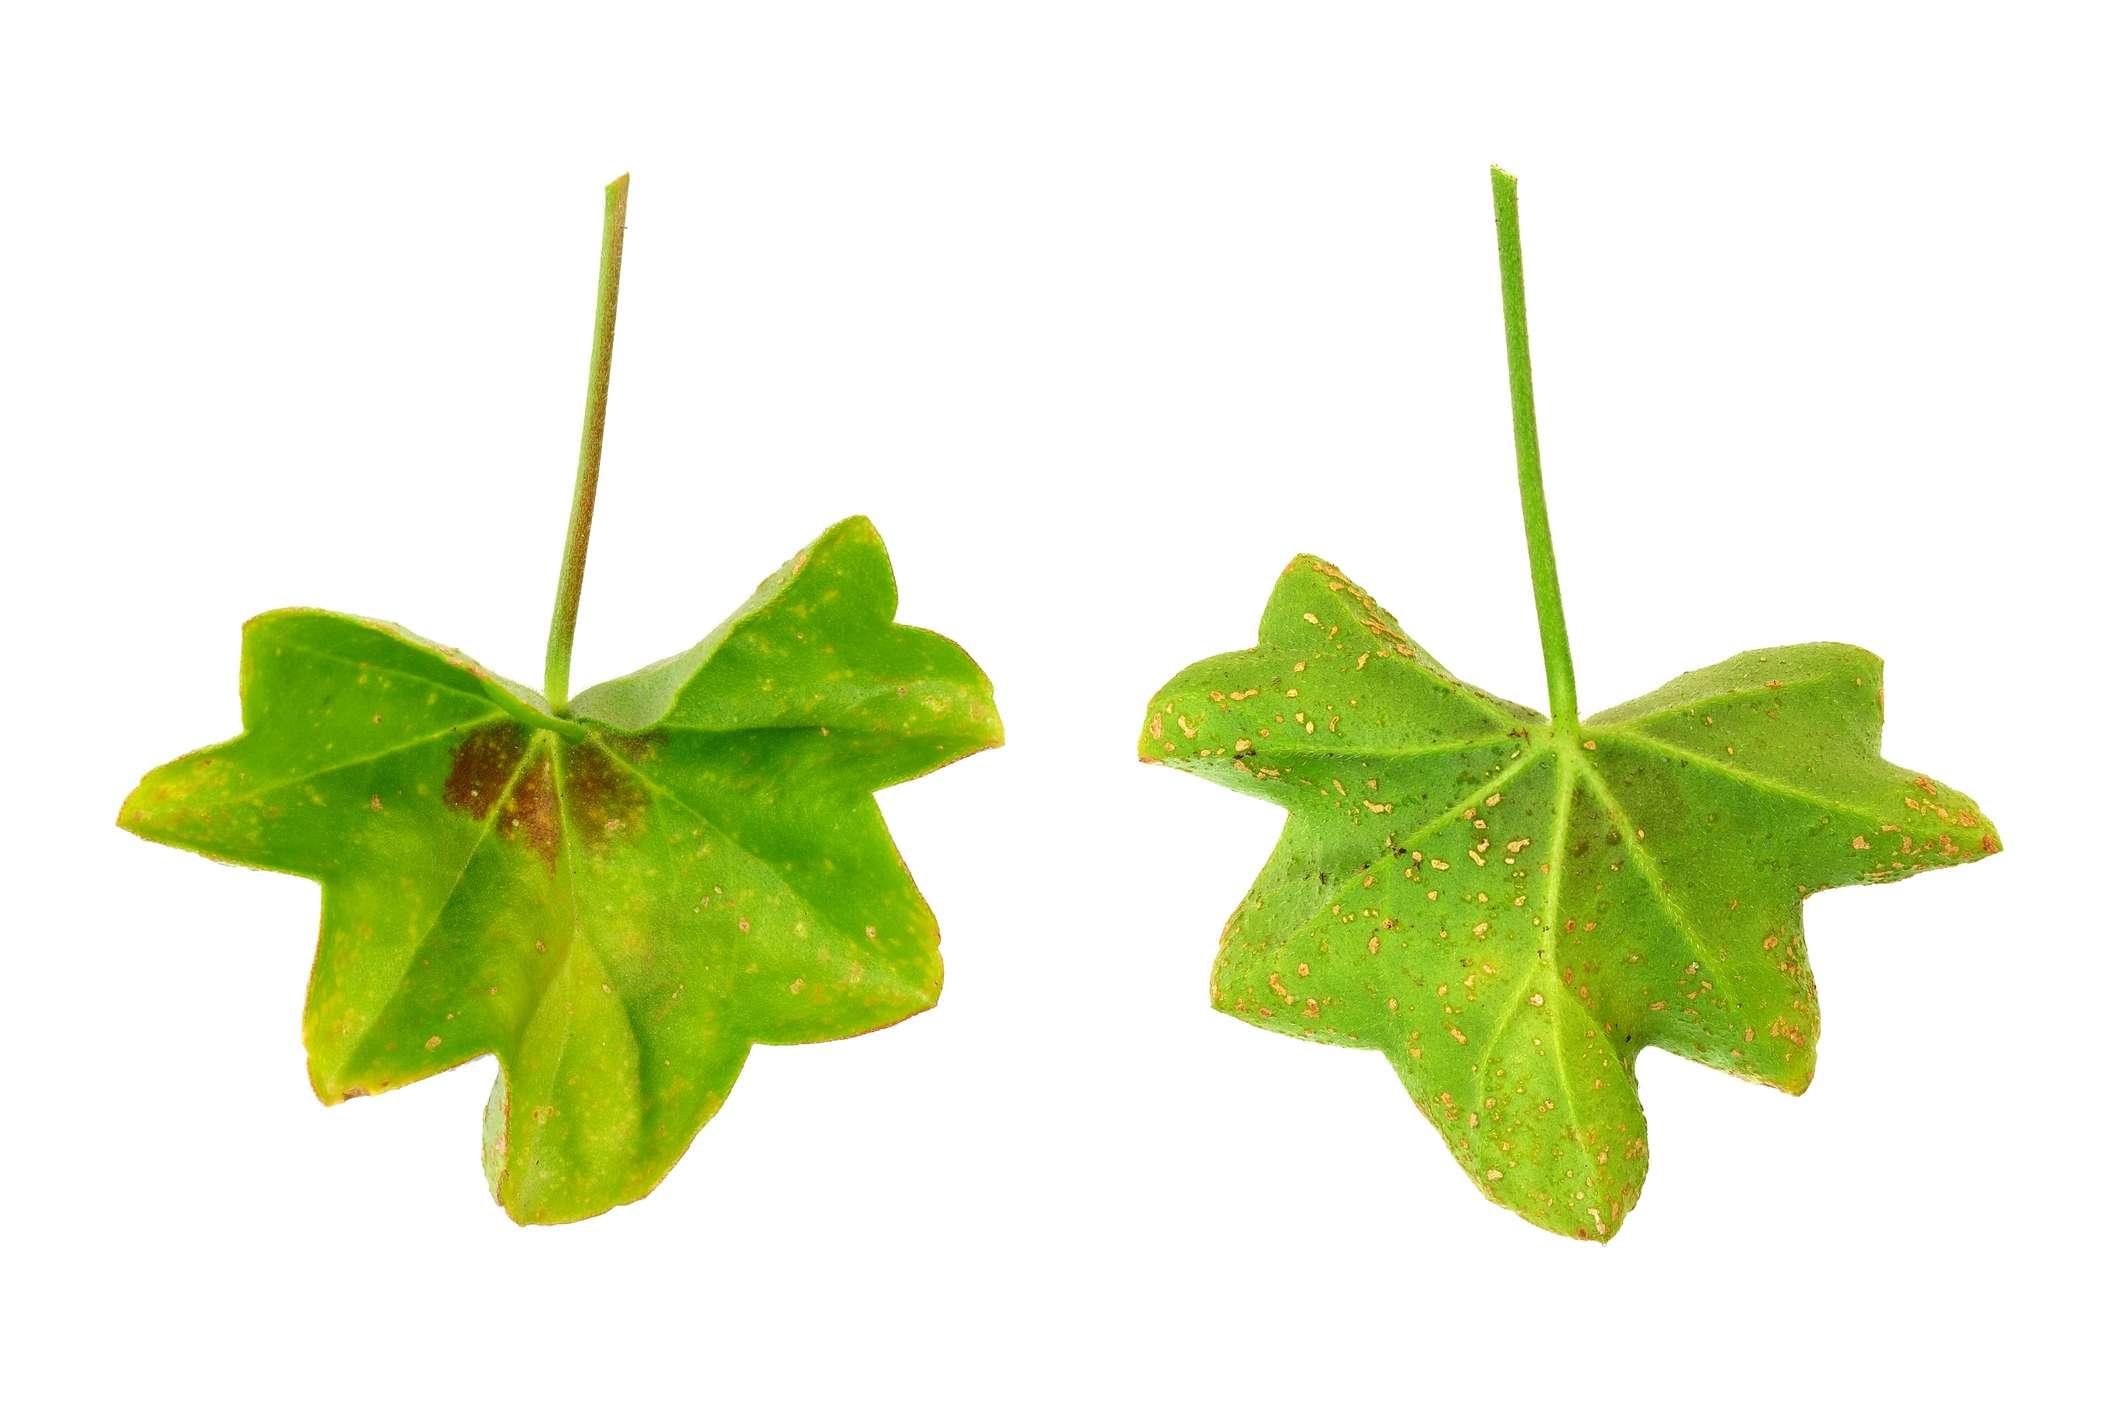 Ivy Geranium Leaf Disease